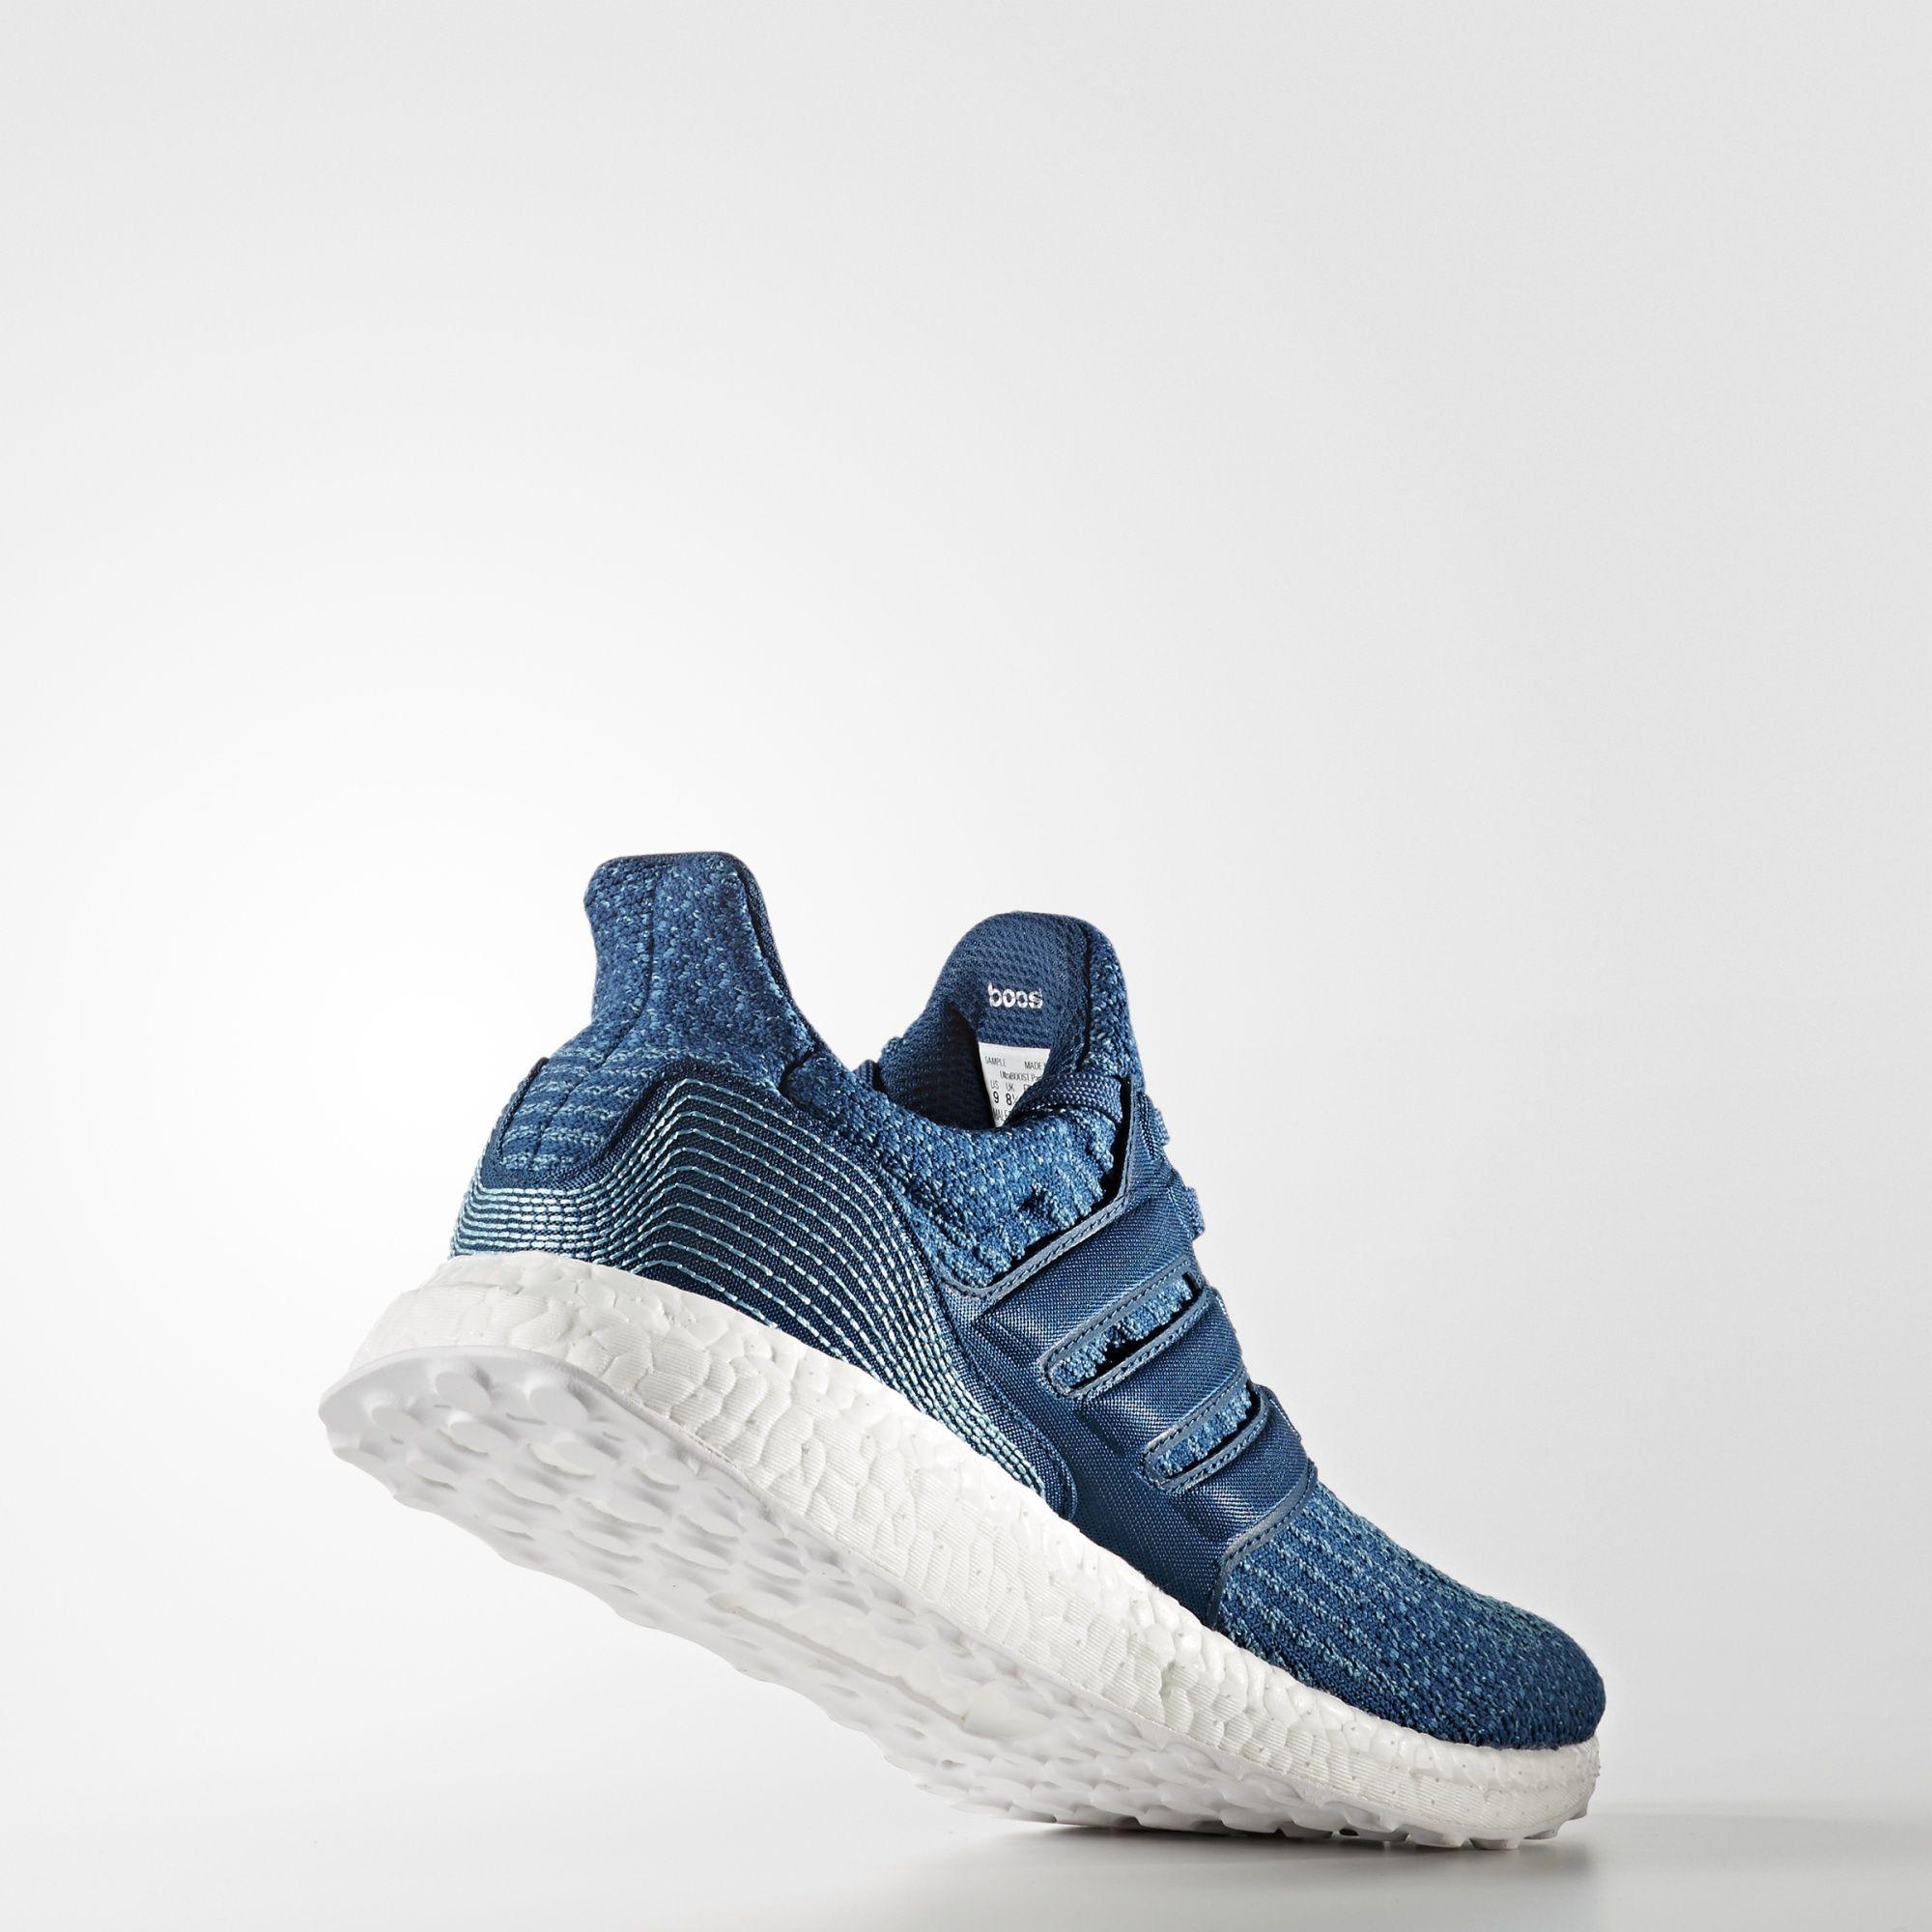 Parley x adidas Ultra Boost Blue Night BB4762 4